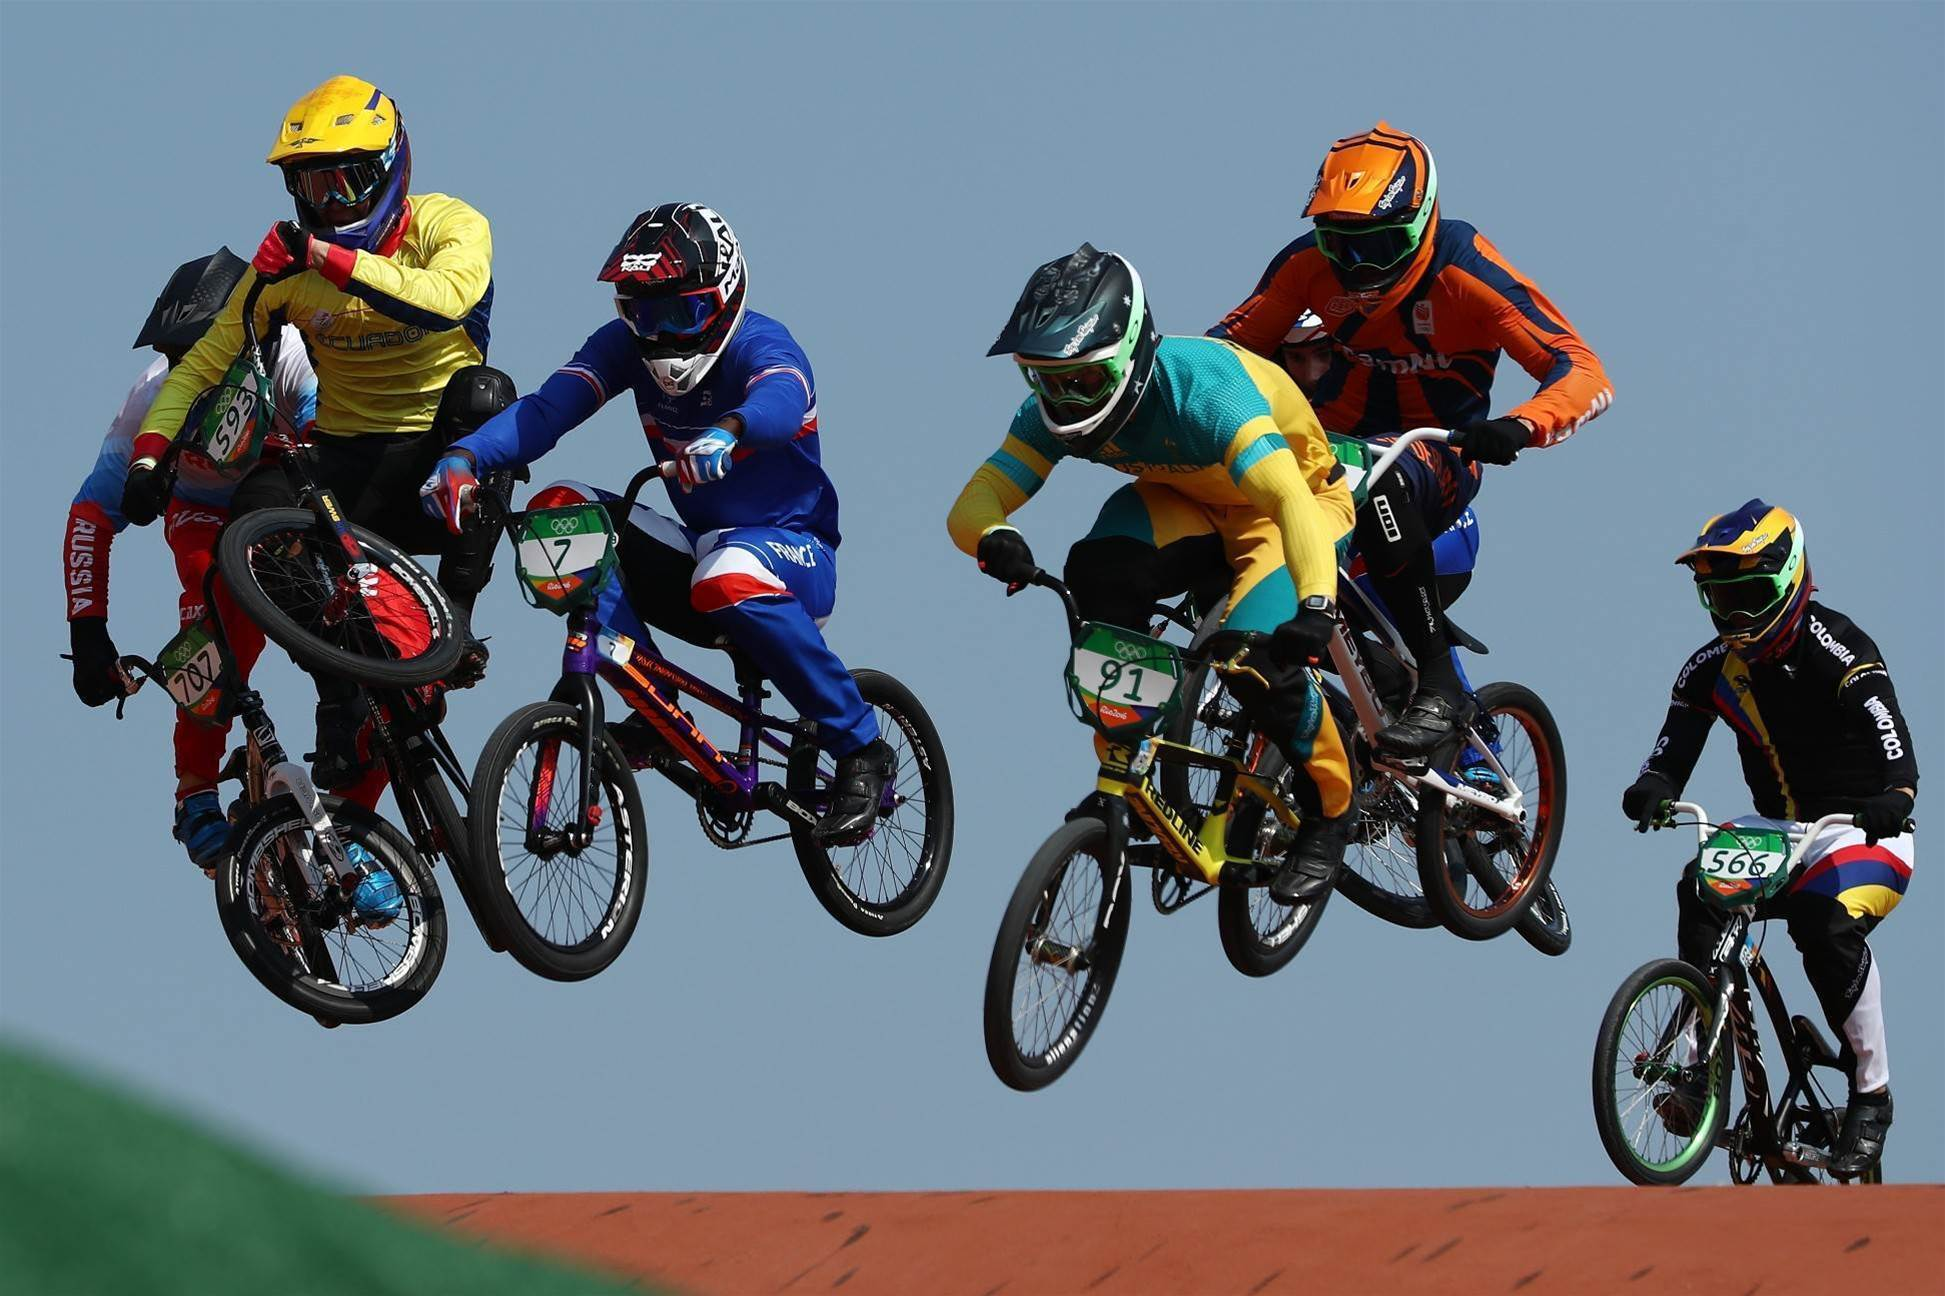 Pic special: BMX thrills